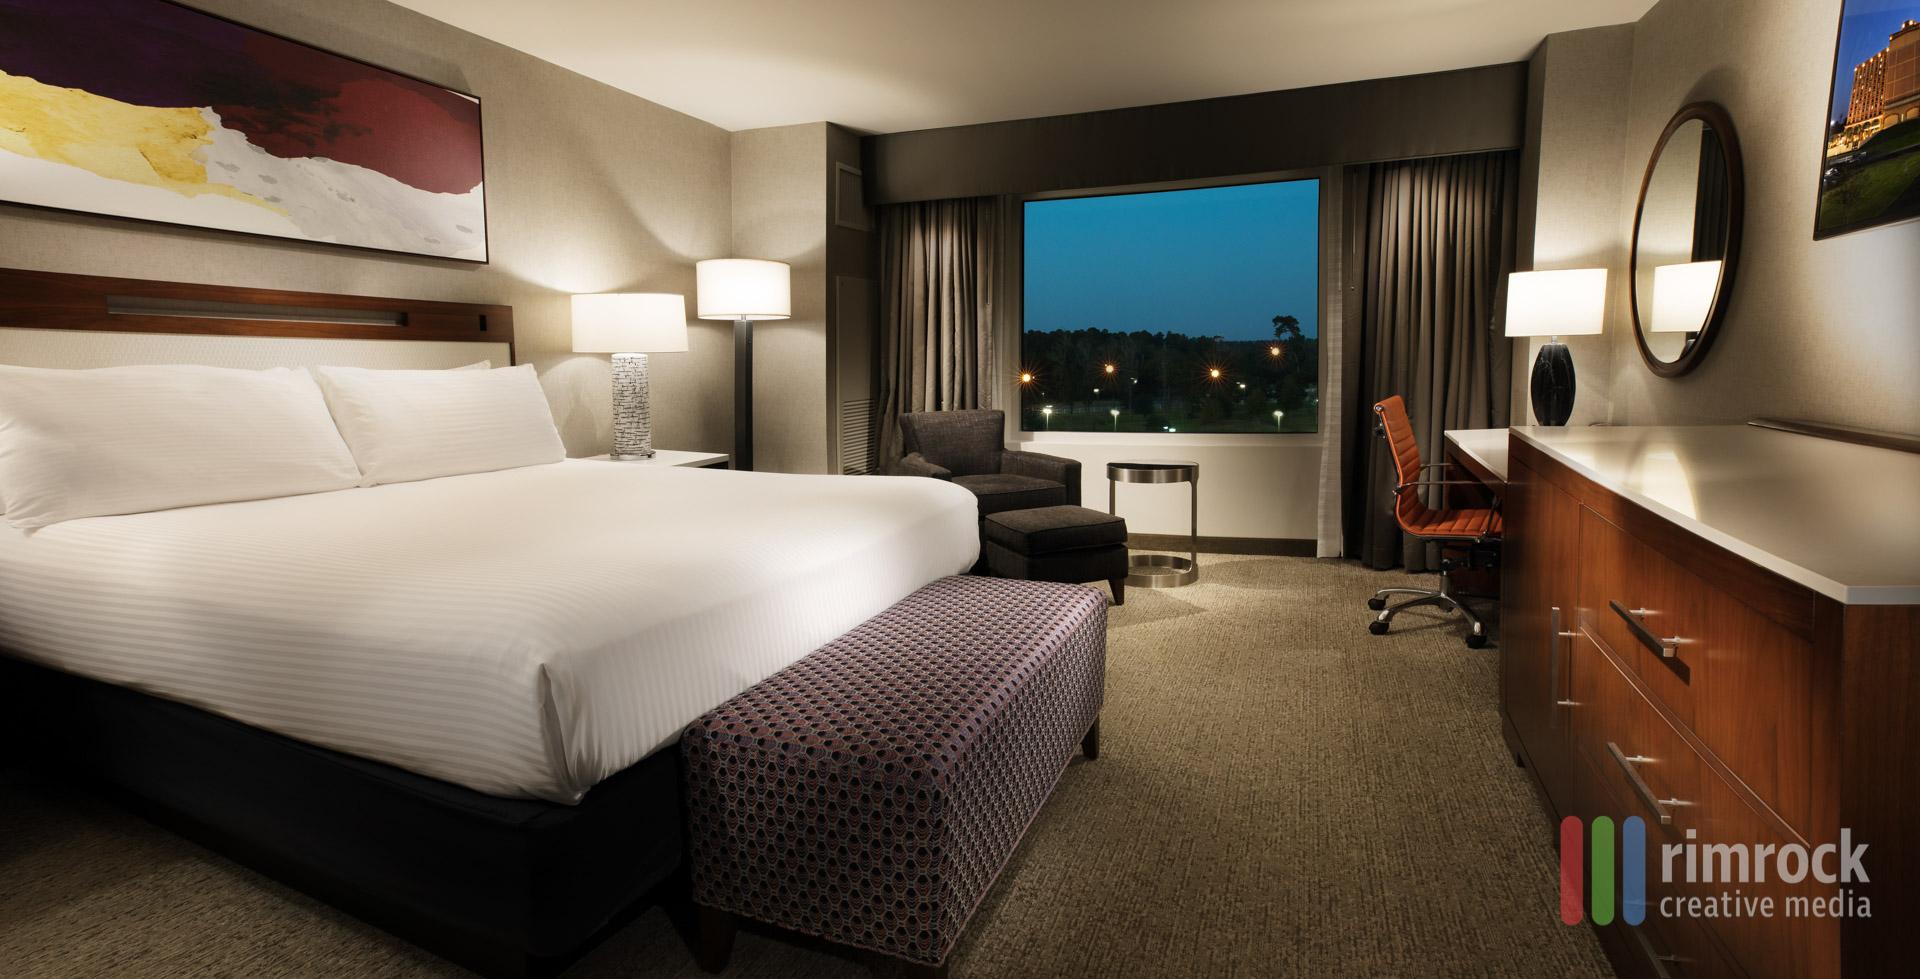 Hotel Room Resort Casino Photography Rimrock Creative Media Delta Downs_King Room Evening Crop A.jpg